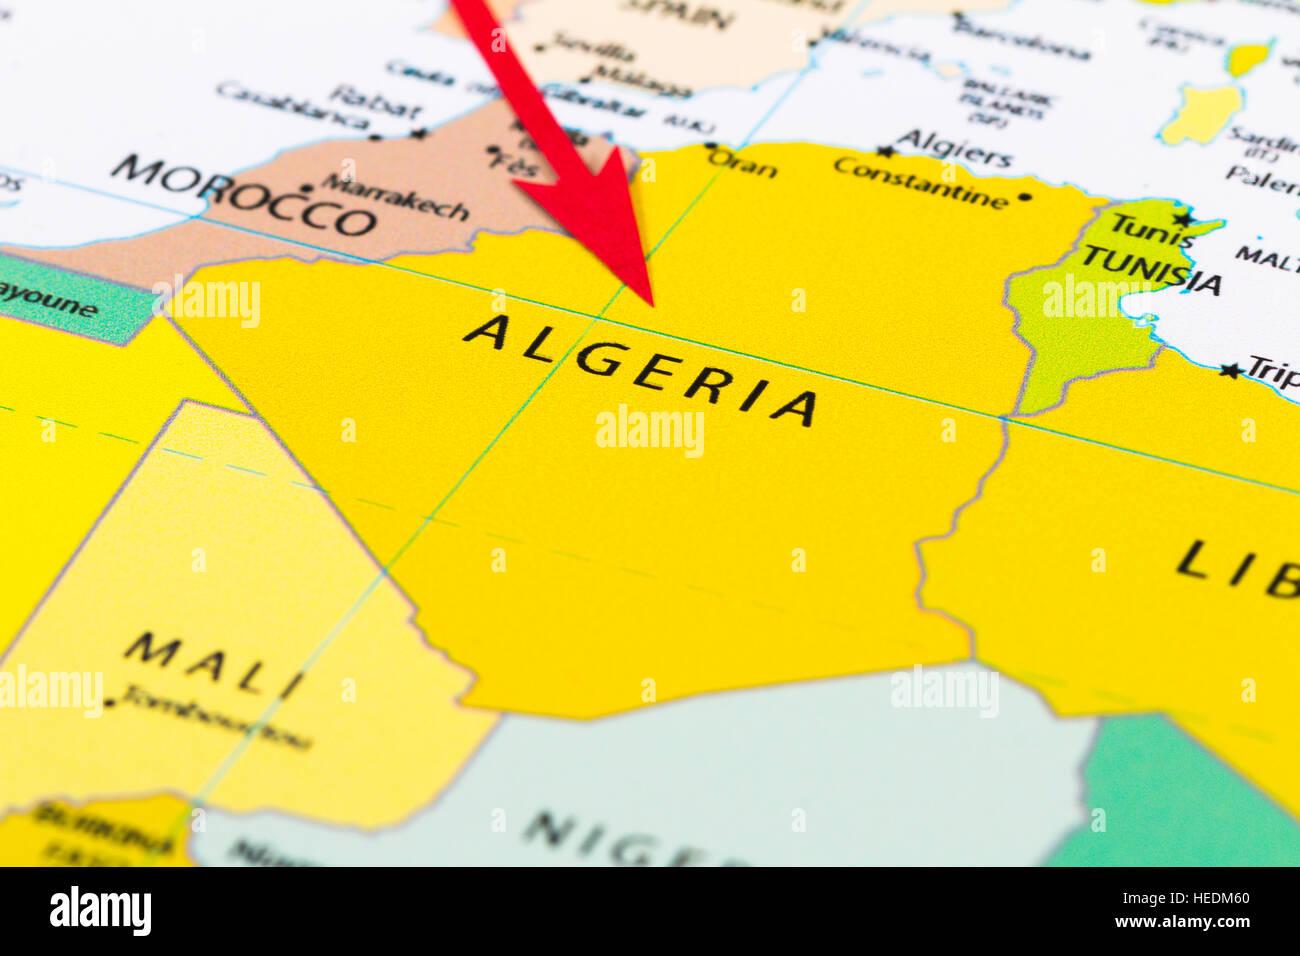 algeria country map stock photos u0026 algeria country map stock